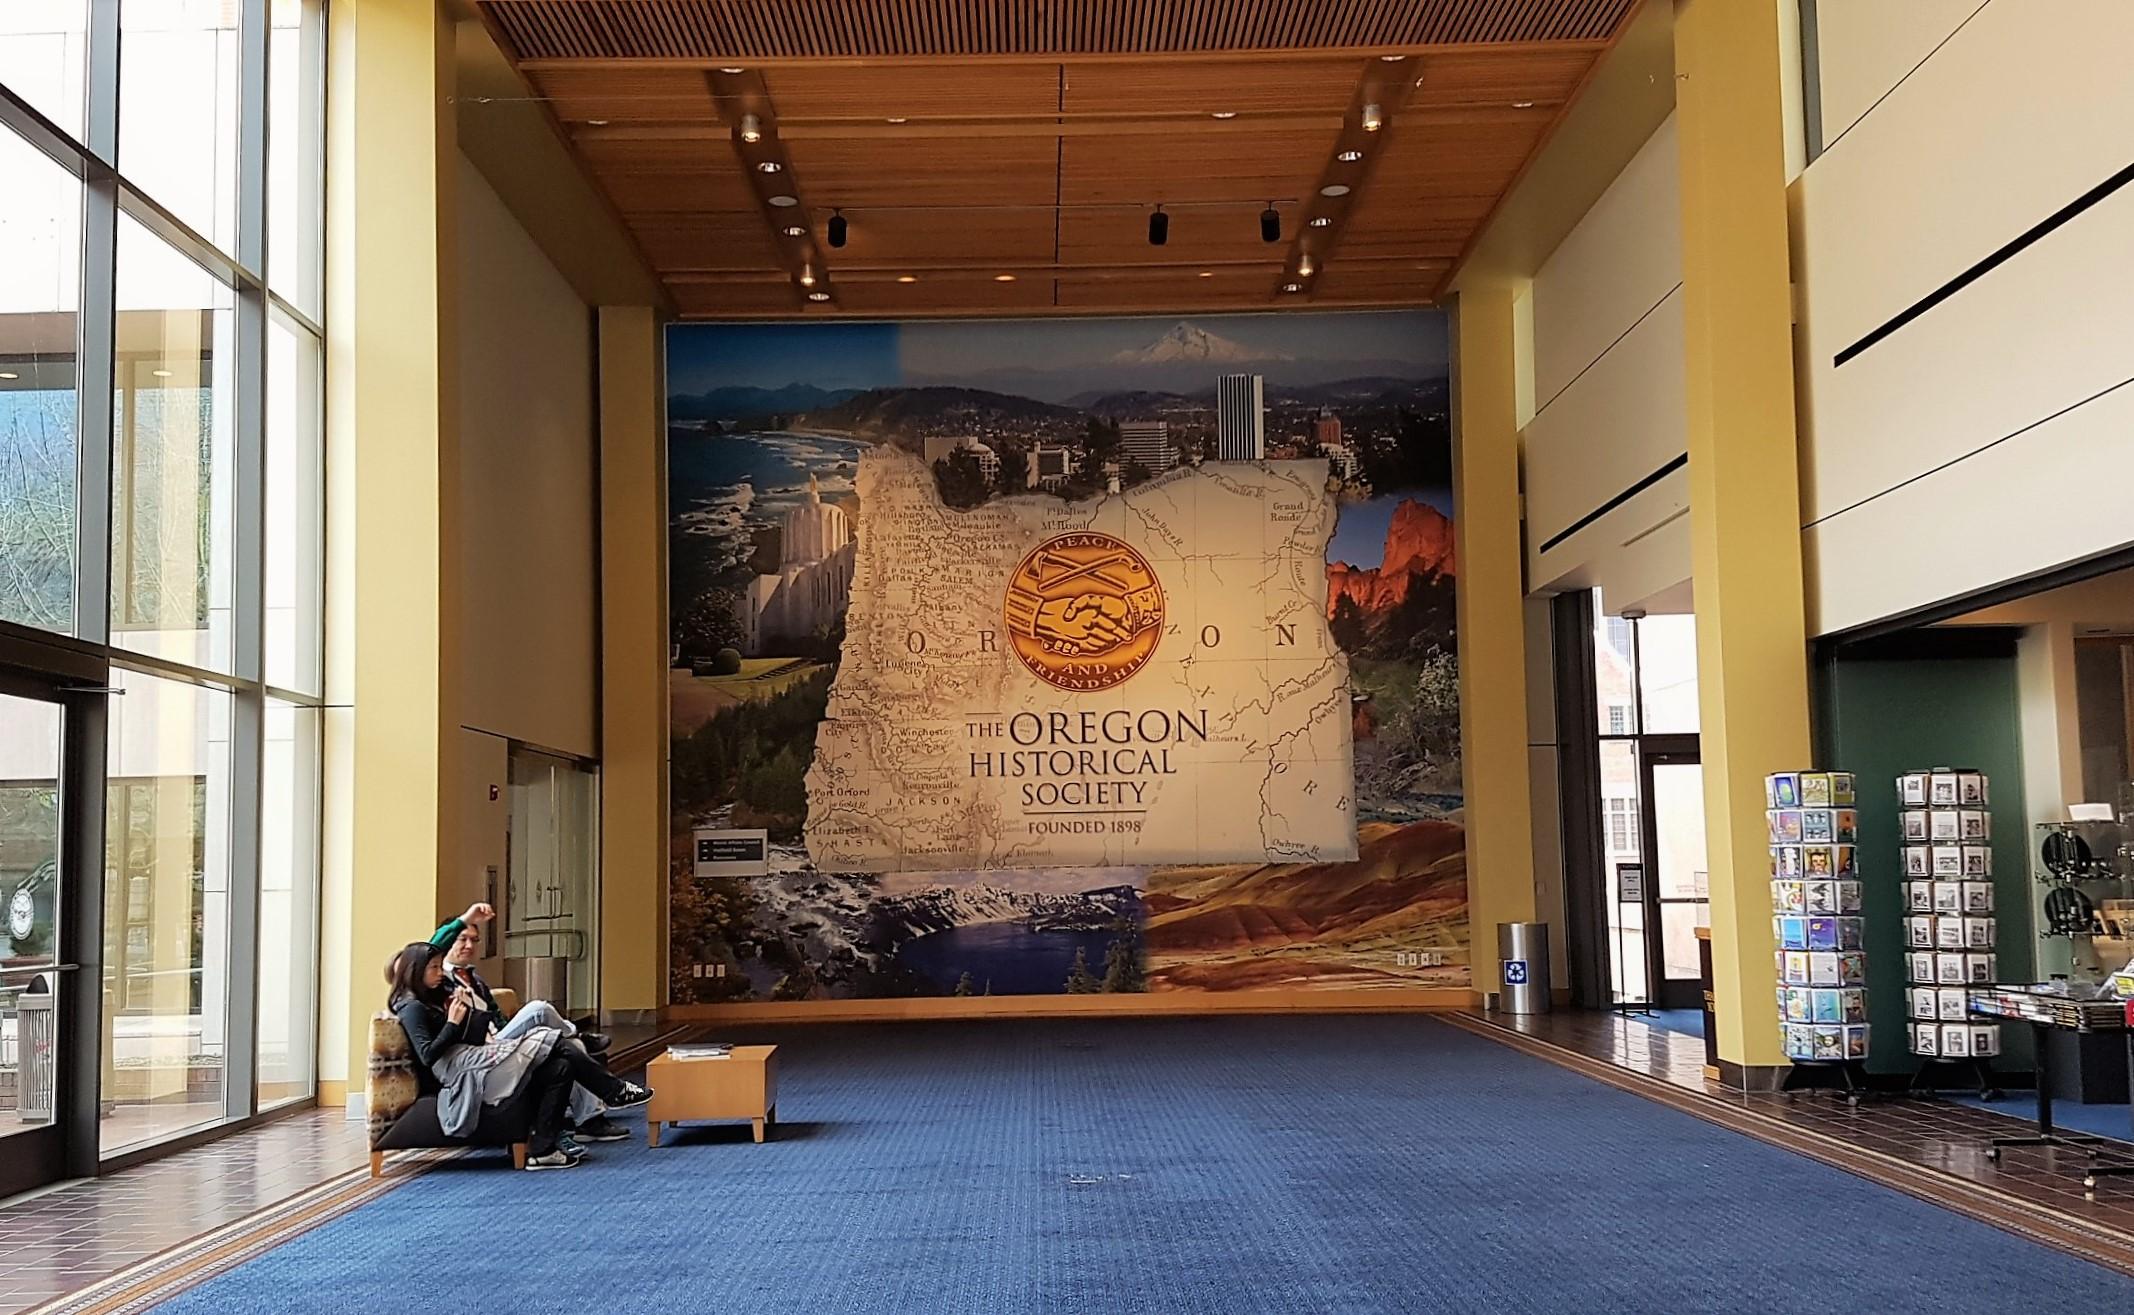 Portland Visitare Oregon Historical Society